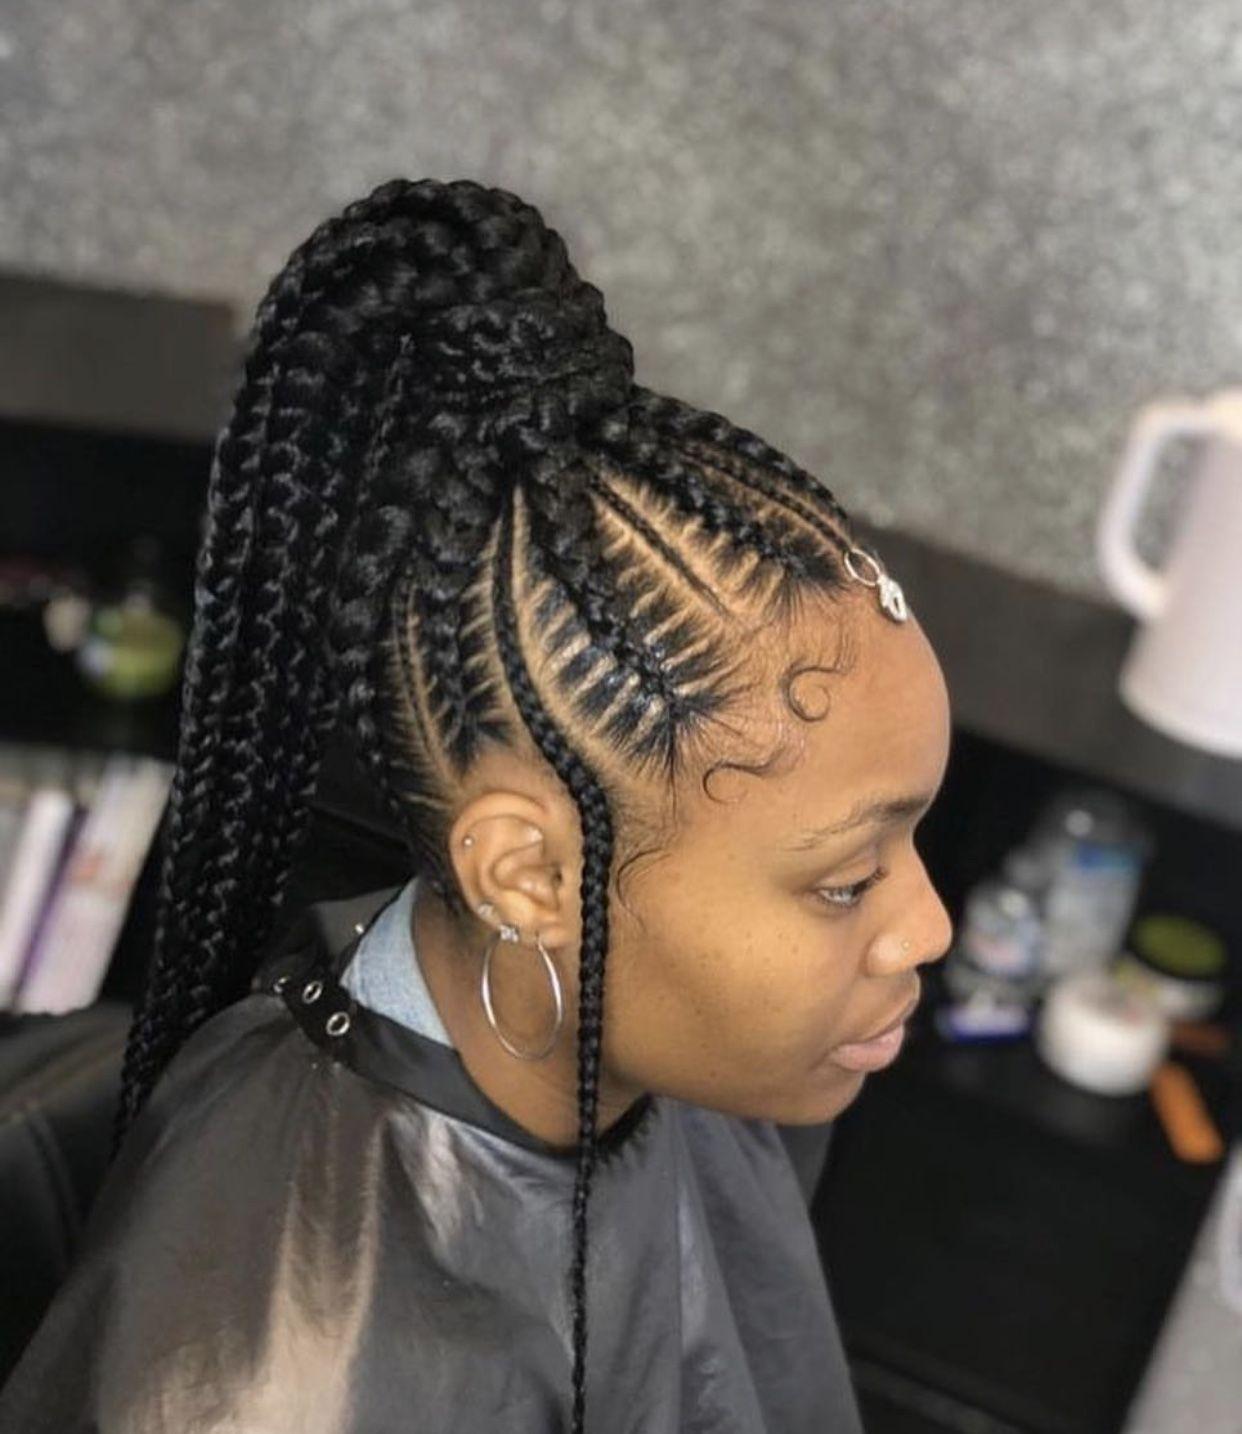 Epingle Par Salimata Konate Sur Coiffure Africaine Idee Coiffure Cheveux Crepus Coiffure Braids Coiffure